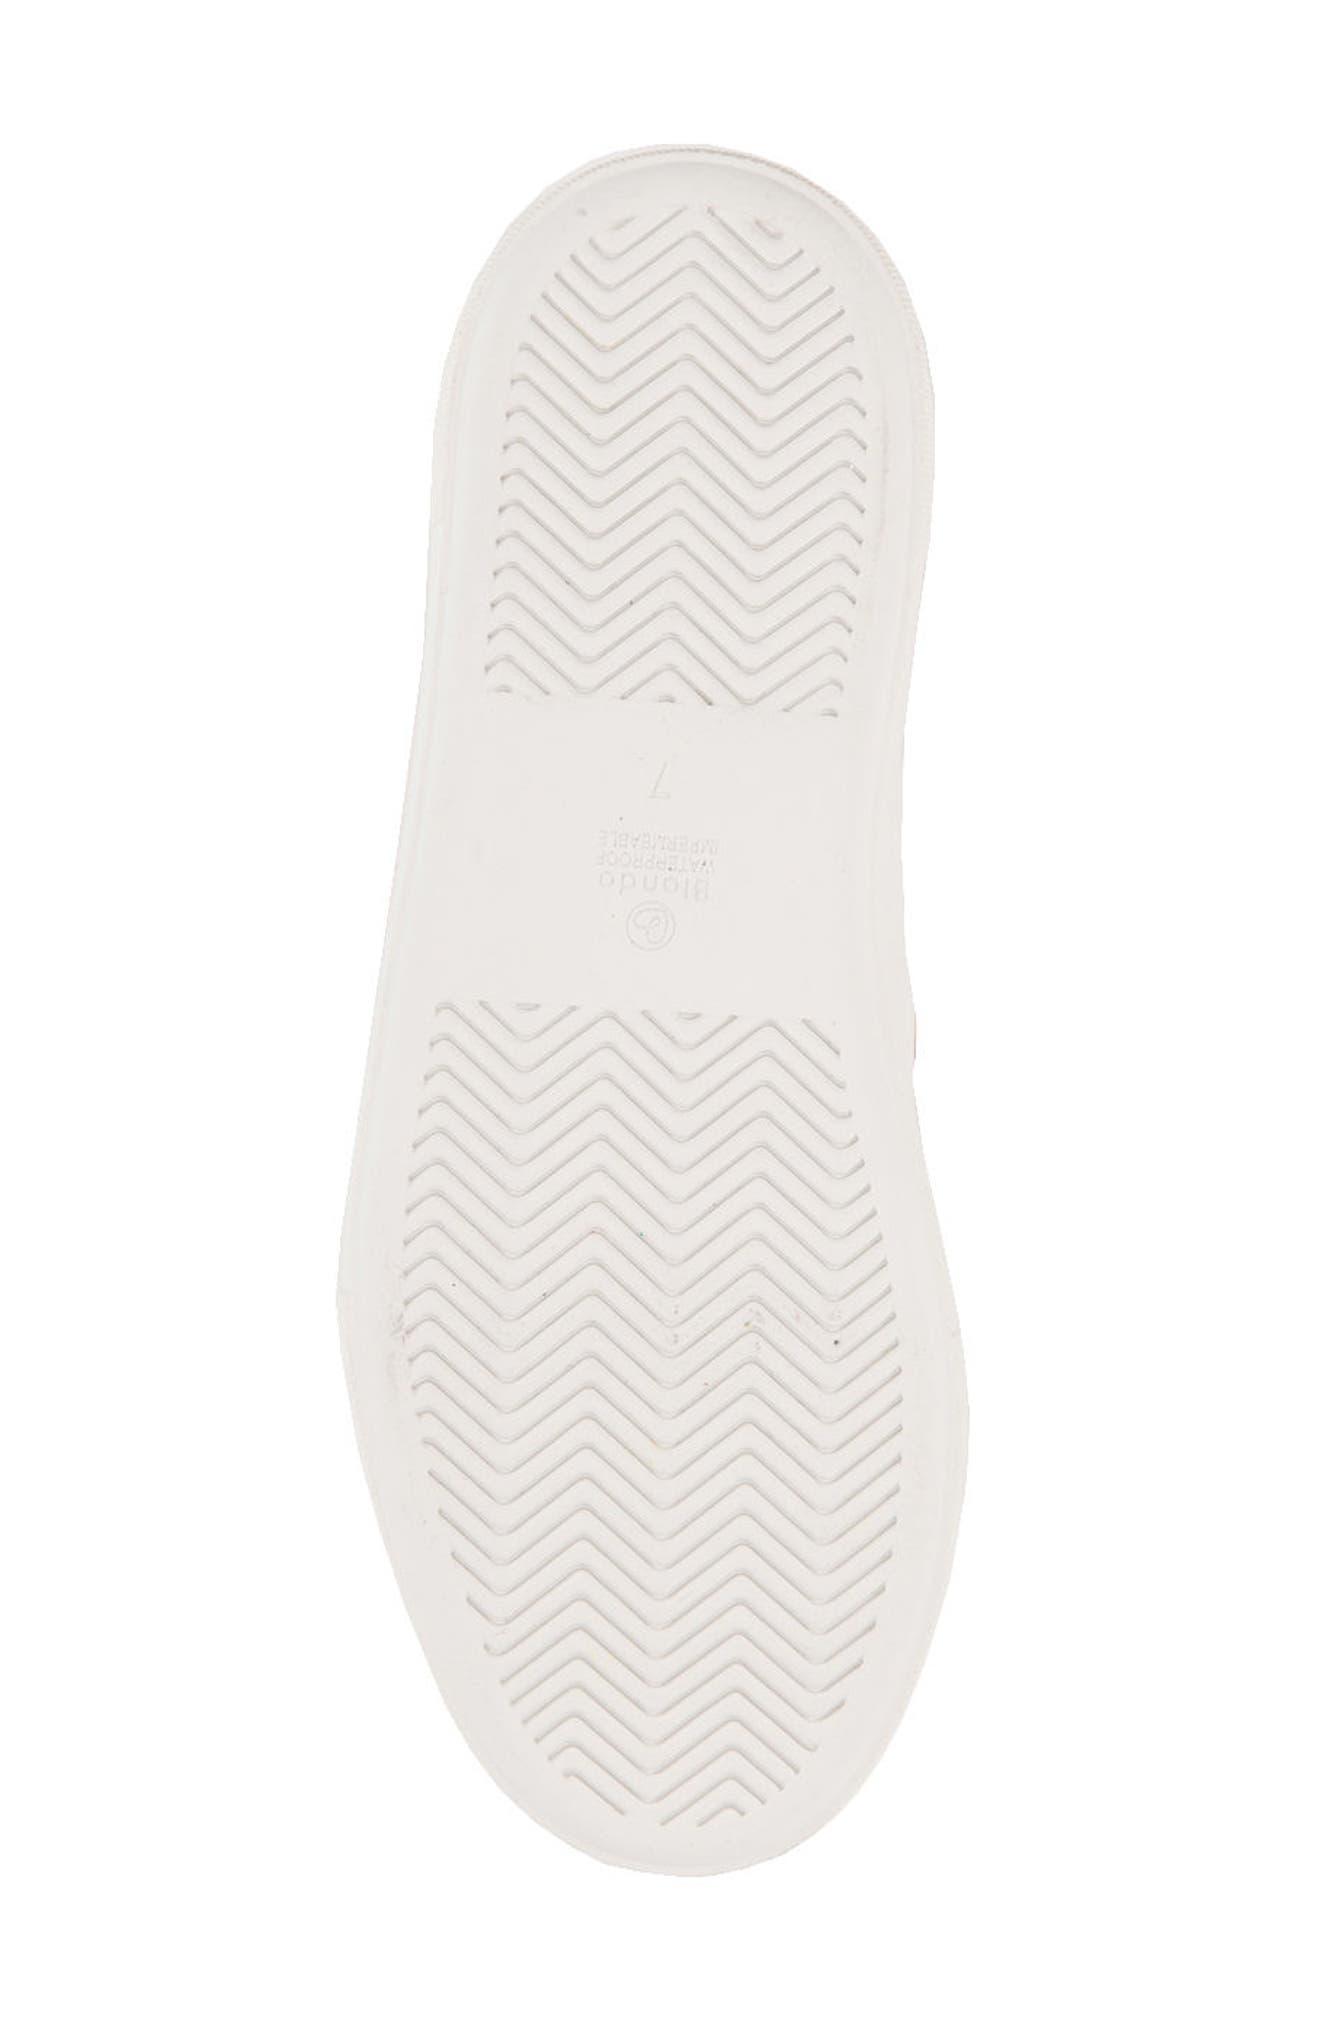 Glance Waterproof Sneaker,                             Alternate thumbnail 6, color,                             LIGHT PINK SUEDE